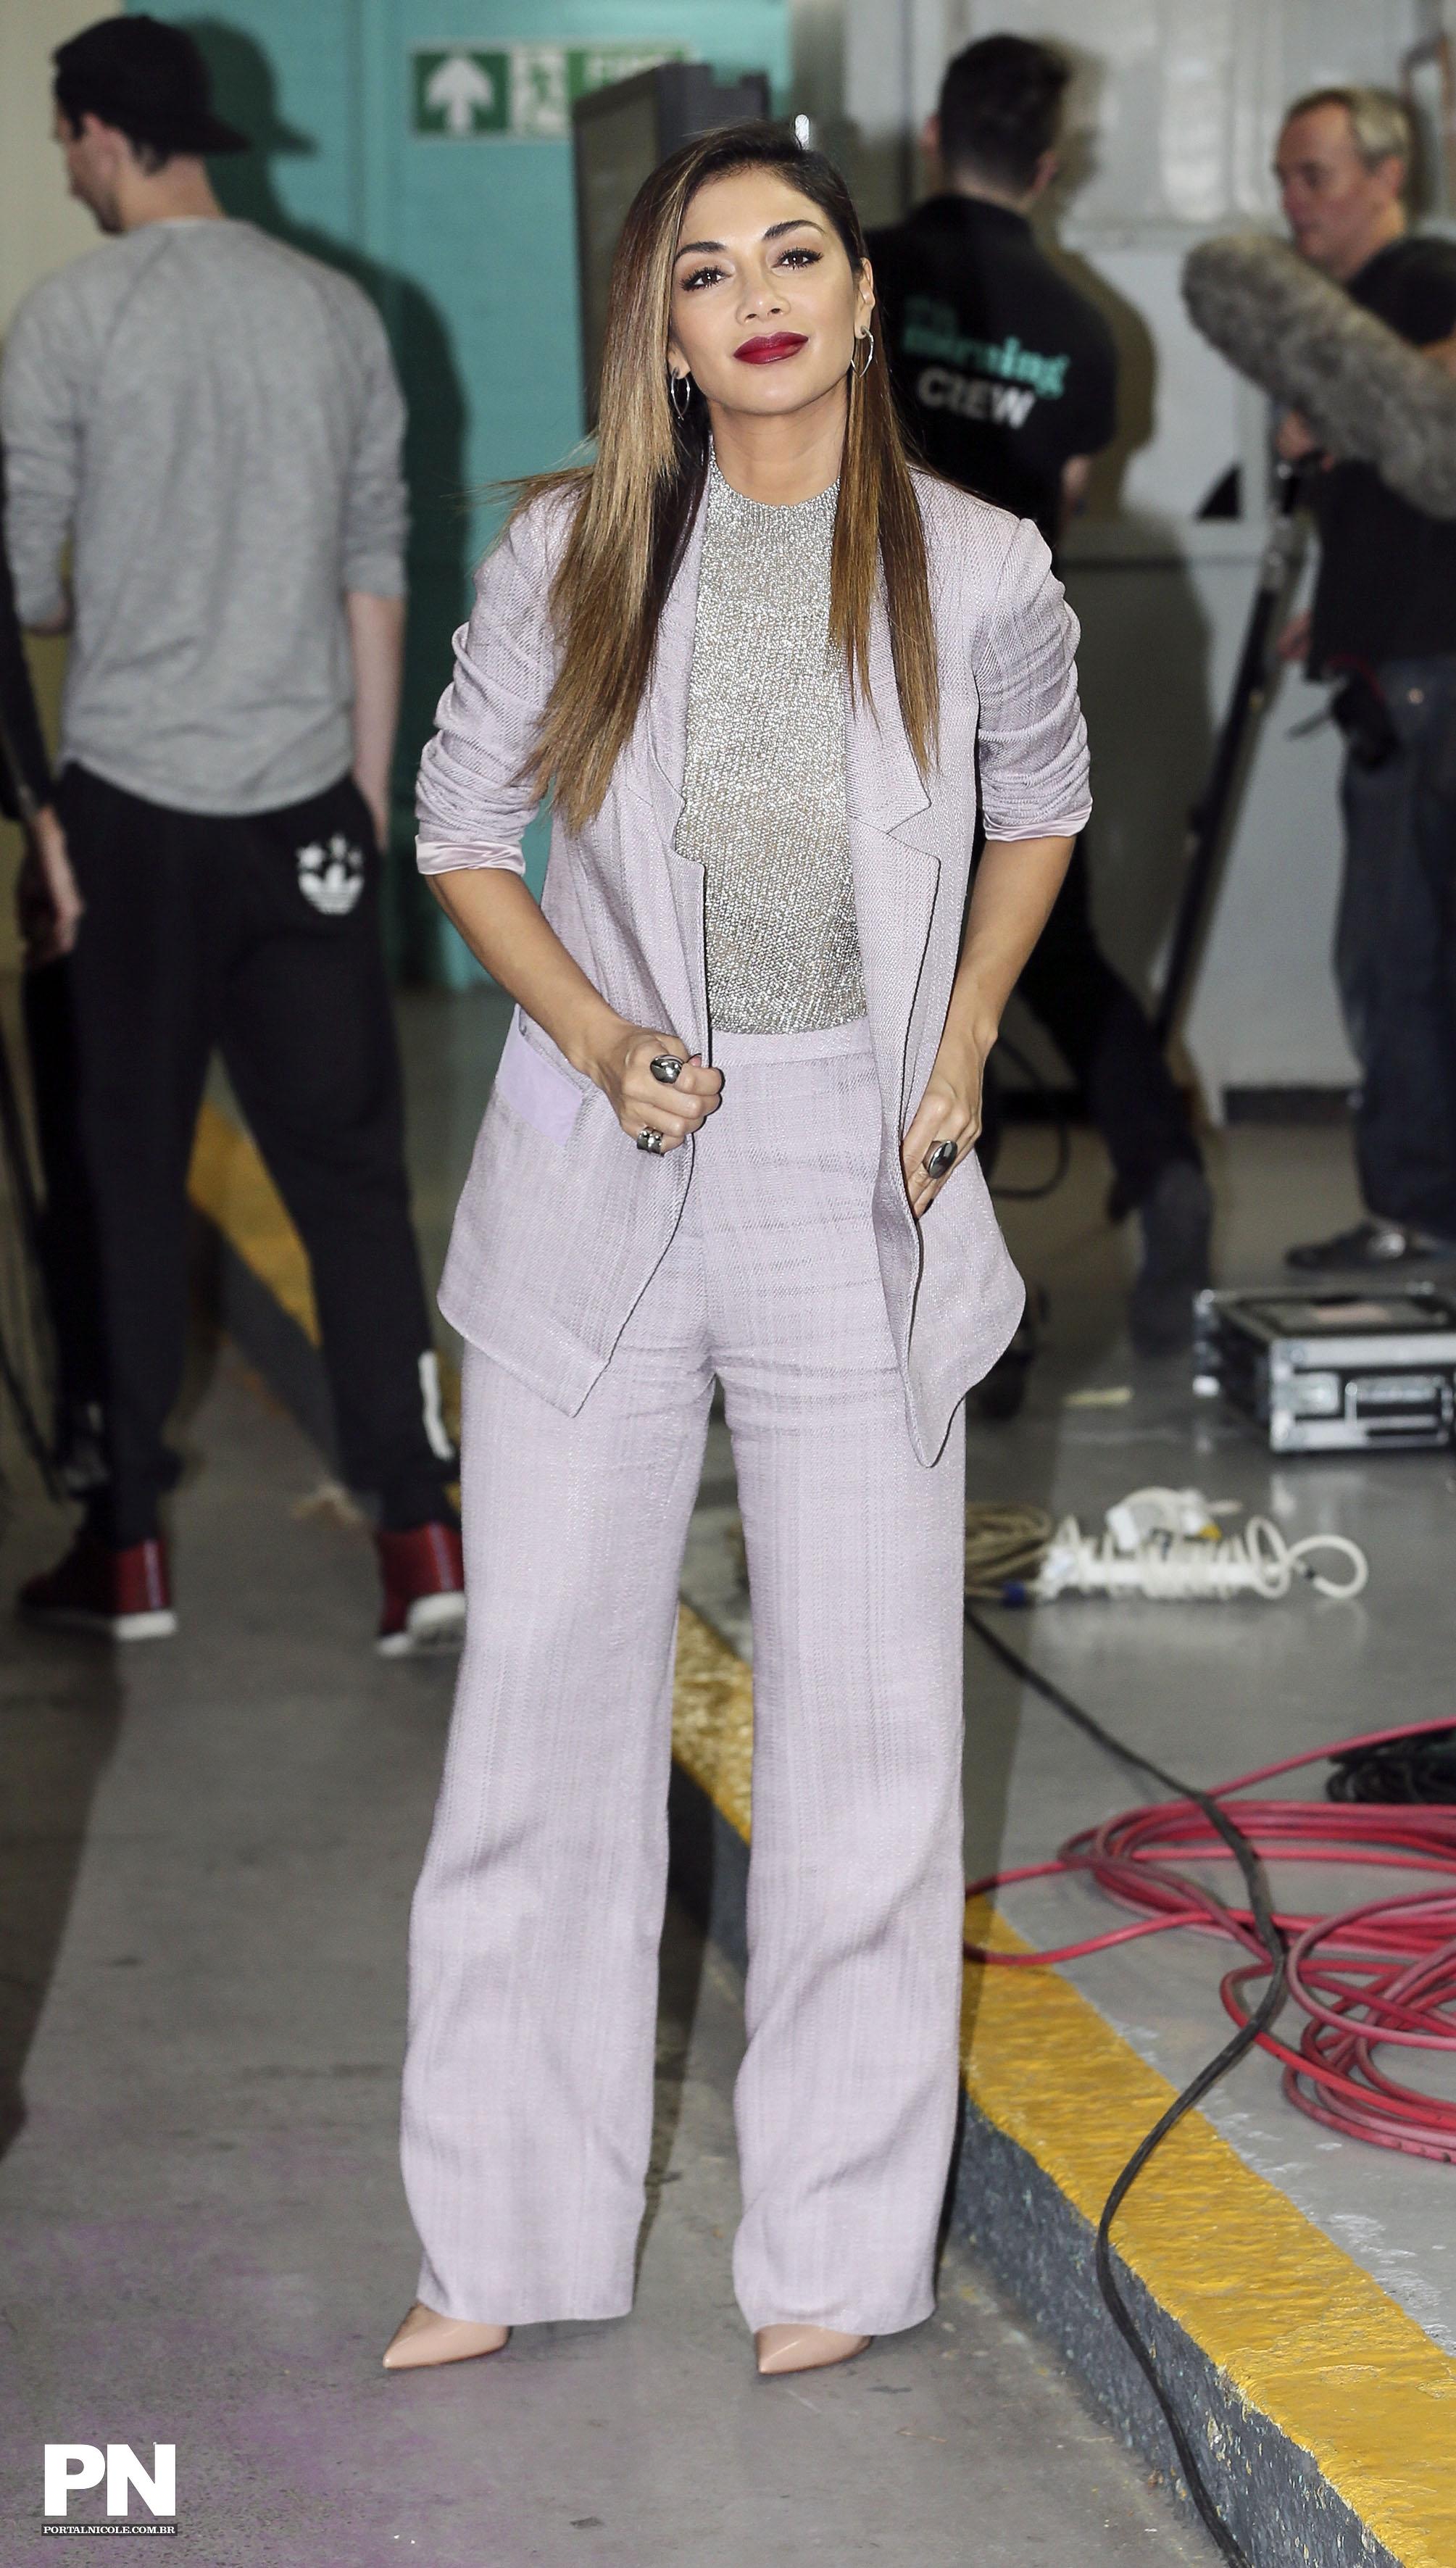 Nicole Scherzinger >> Candids/Apariciones/Shoots - Página 11 000010